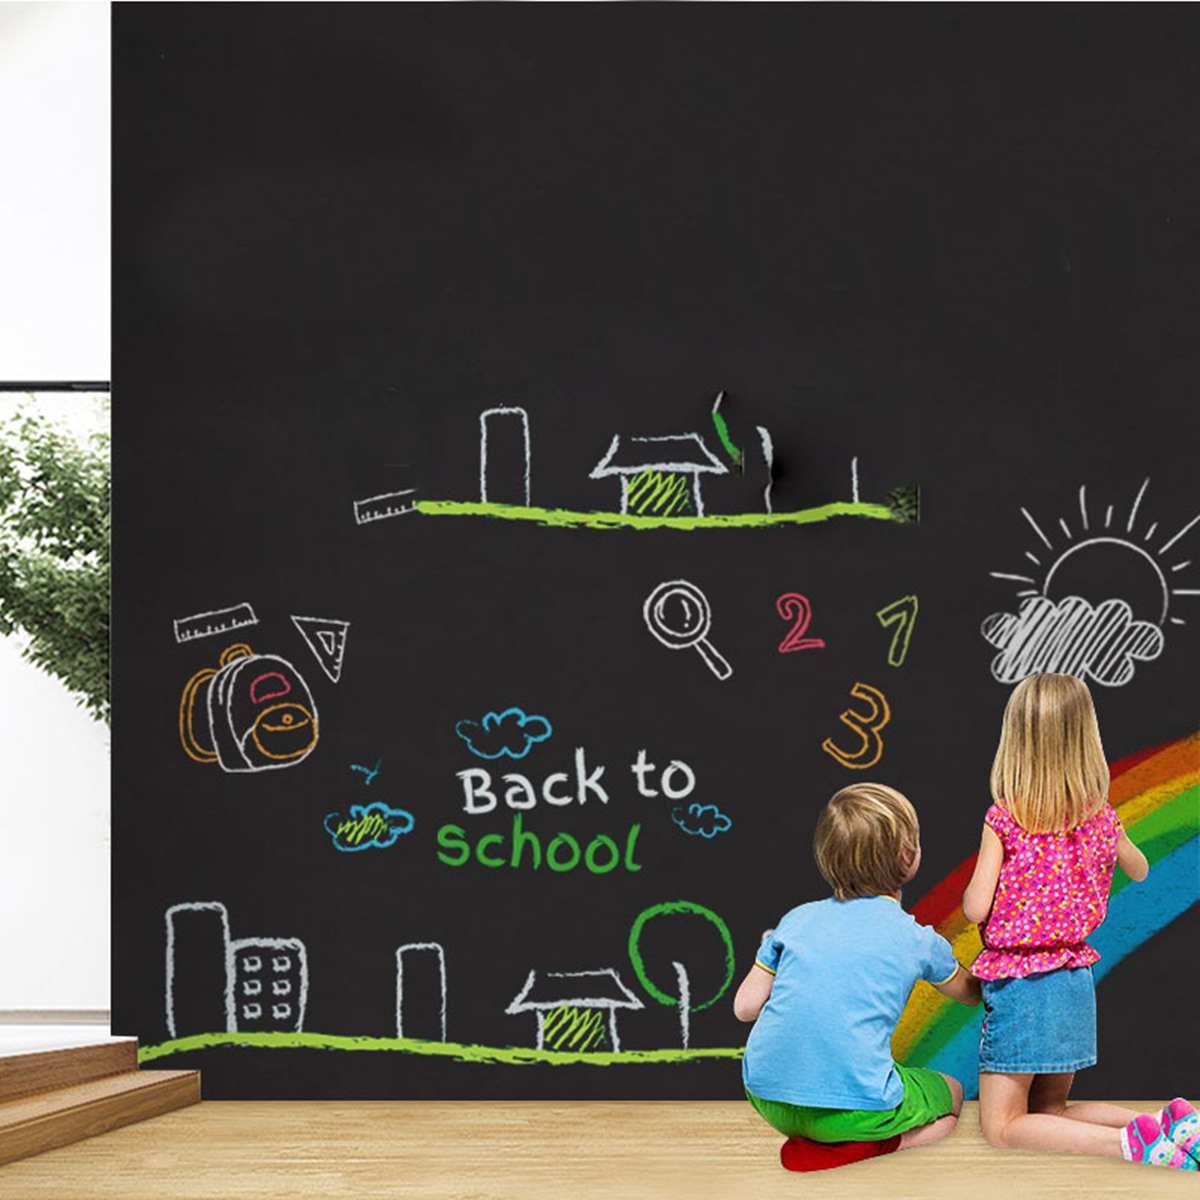 45X100cm Wall Stickers Office Presentation Boards Whiteboard Chalk Drawing Self-adhesive Blackboard Stickers Children Graffiti